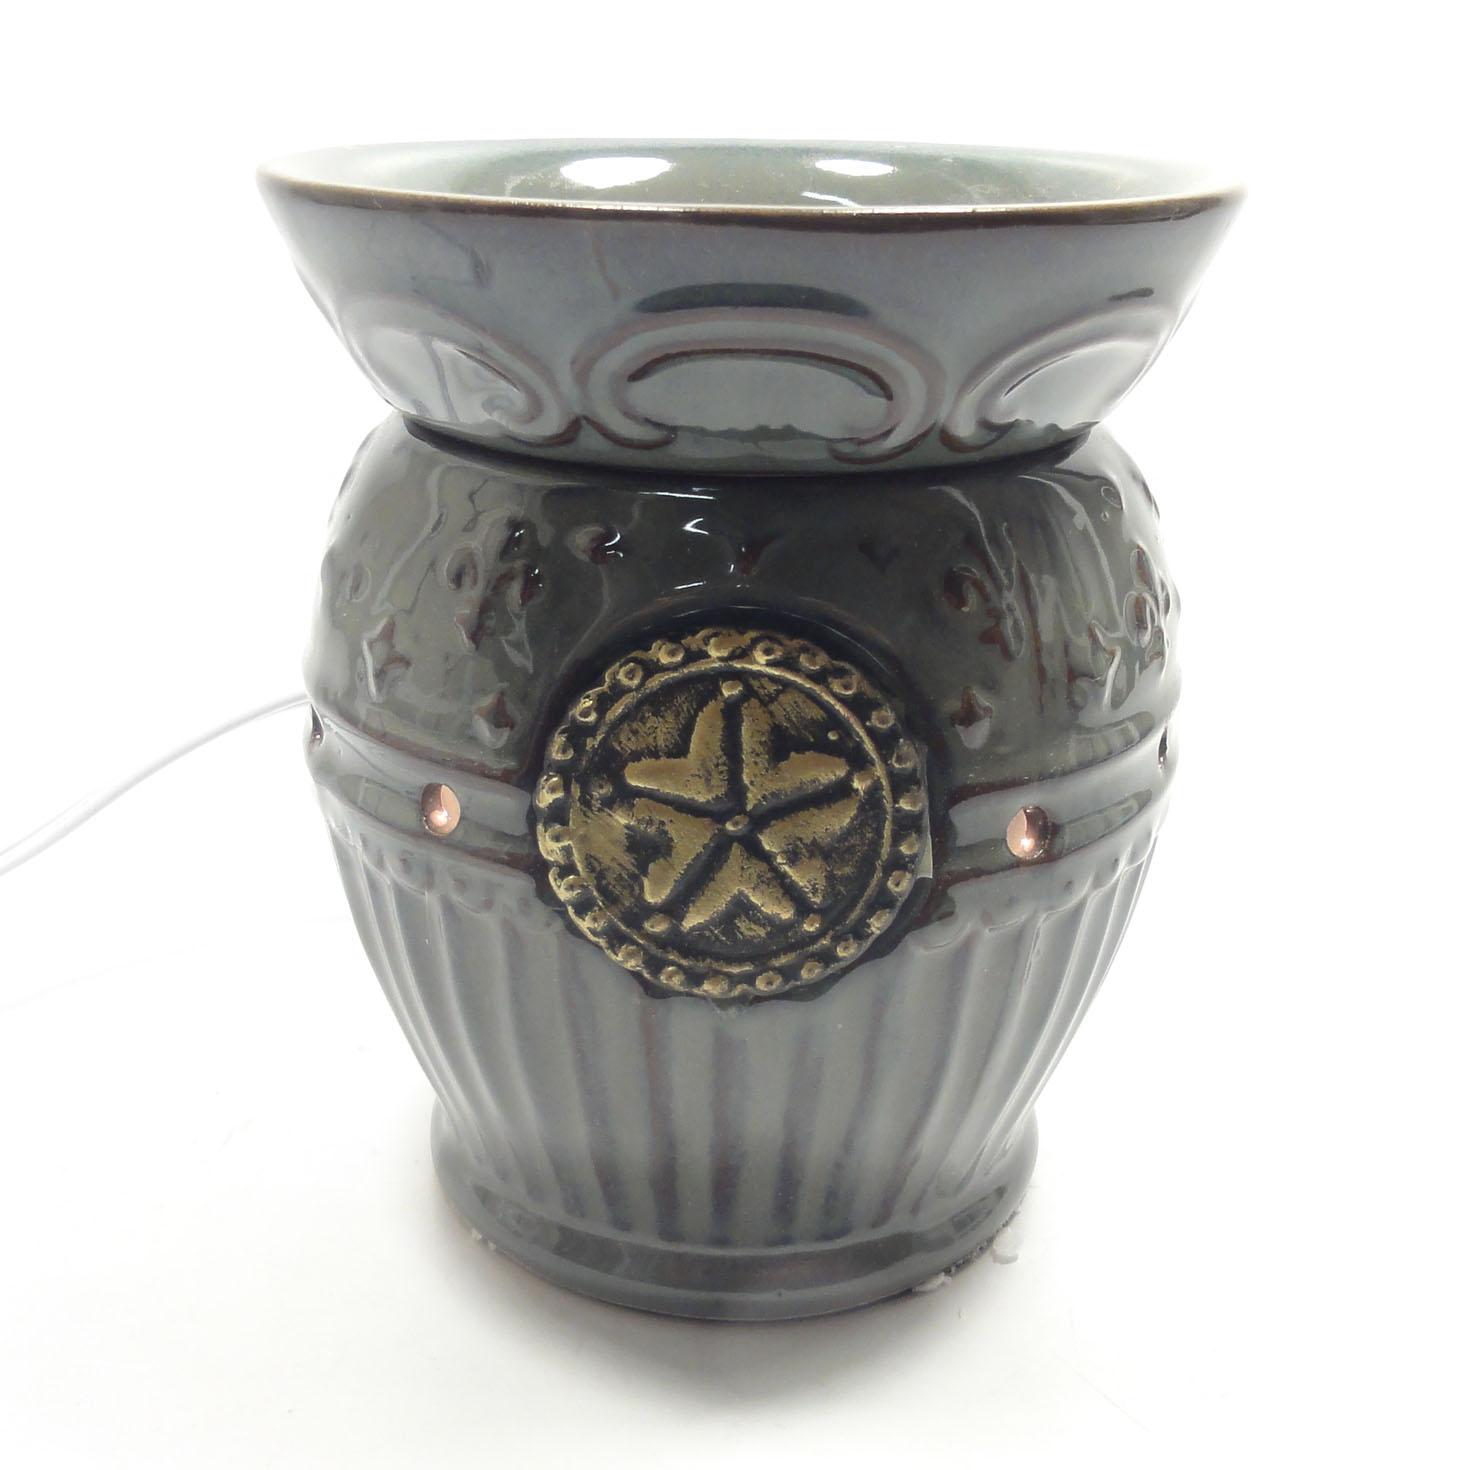 classic ceramic decorative electric fragrance oil tart lamp diffuser. Black Bedroom Furniture Sets. Home Design Ideas